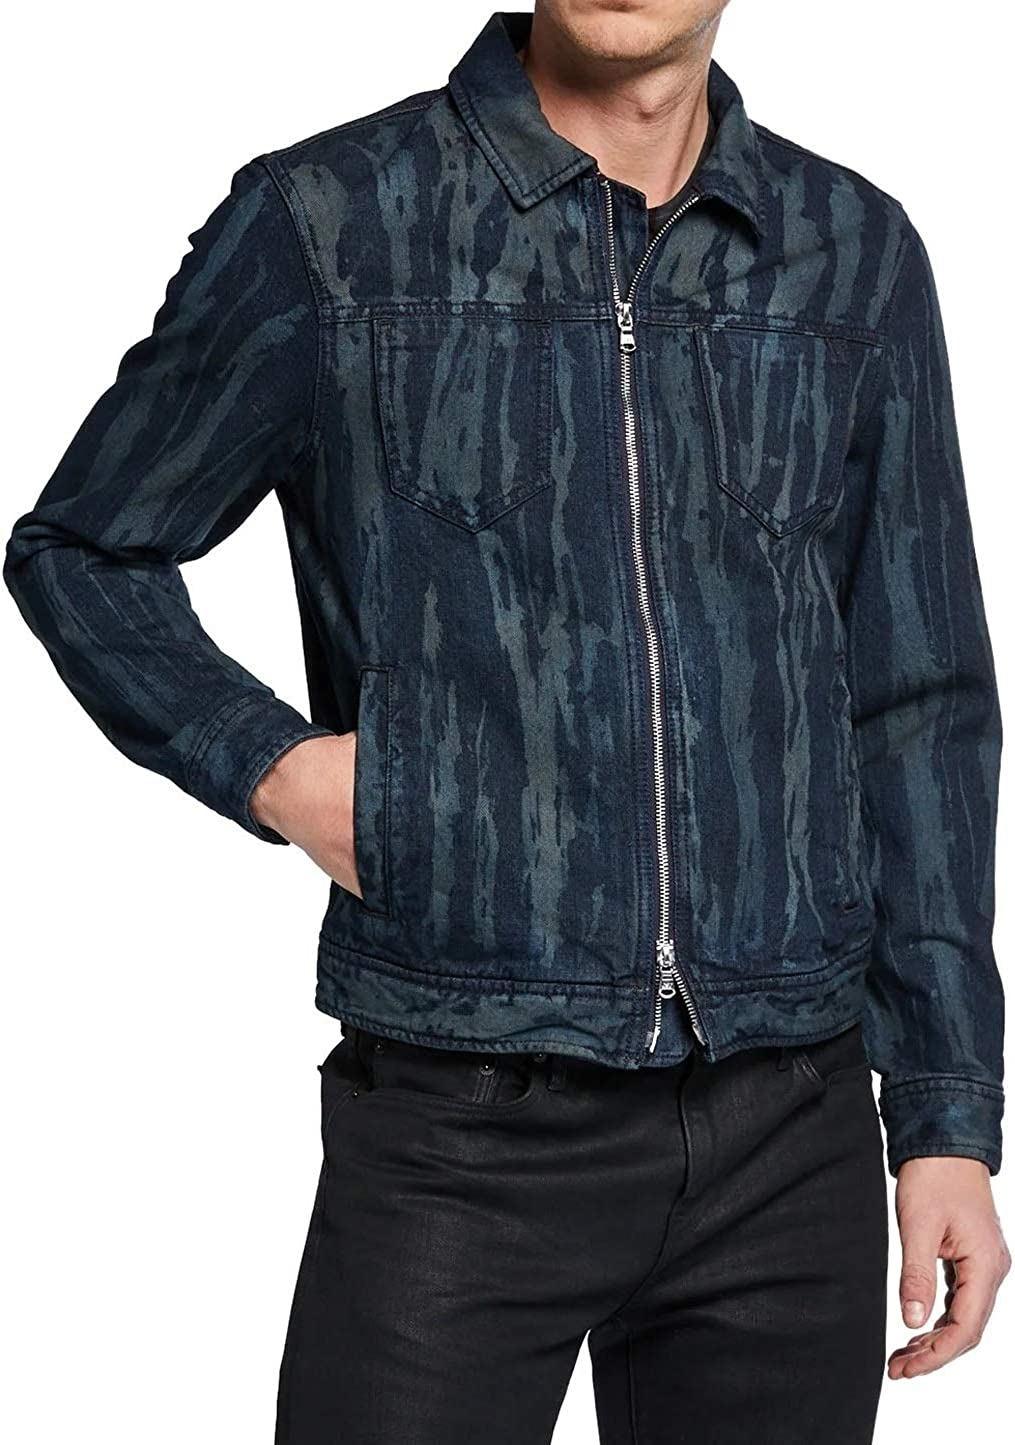 John Varvatos Star USA Men's Lucas Zip Up Trucker Ink Drop Jean Jacket X-Large Navy